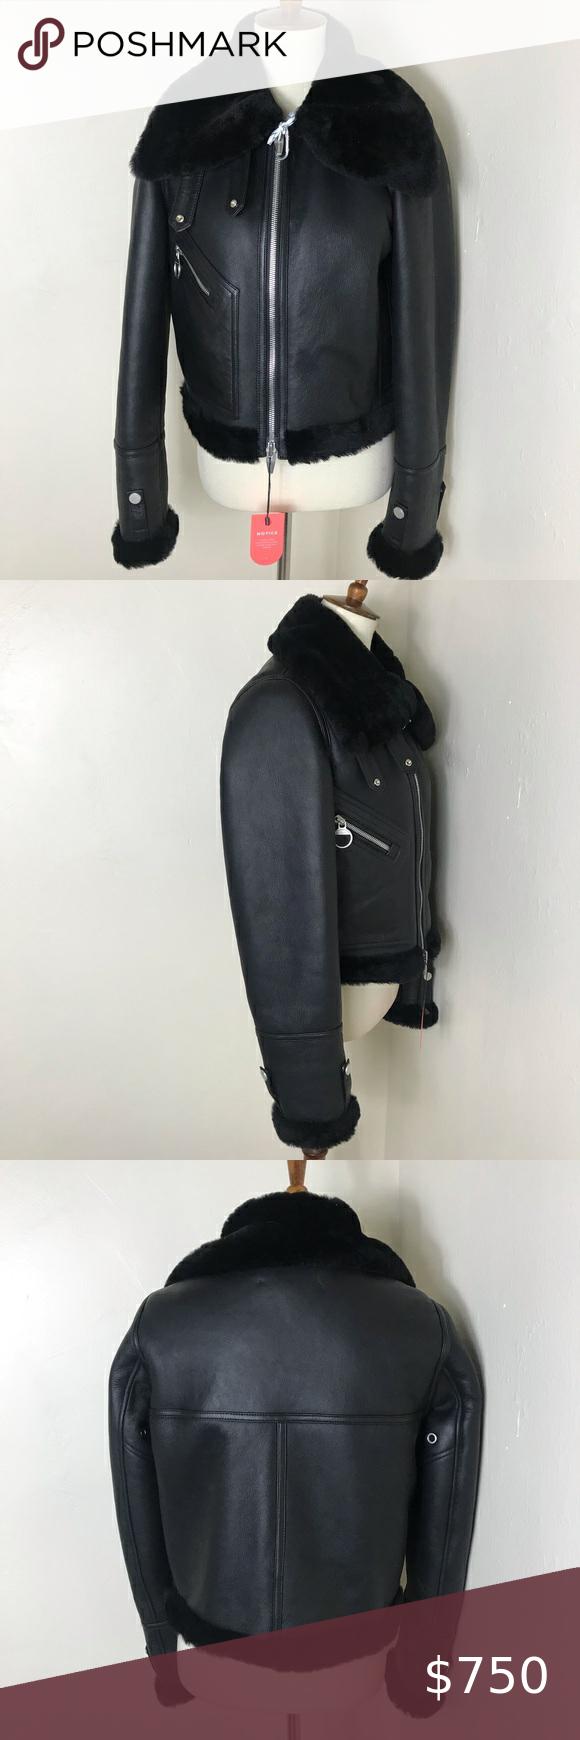 The Arrivals Moya Mini Shearling Leather Jacket Leather Jacket Shearling Shearling Coat [ 1740 x 580 Pixel ]